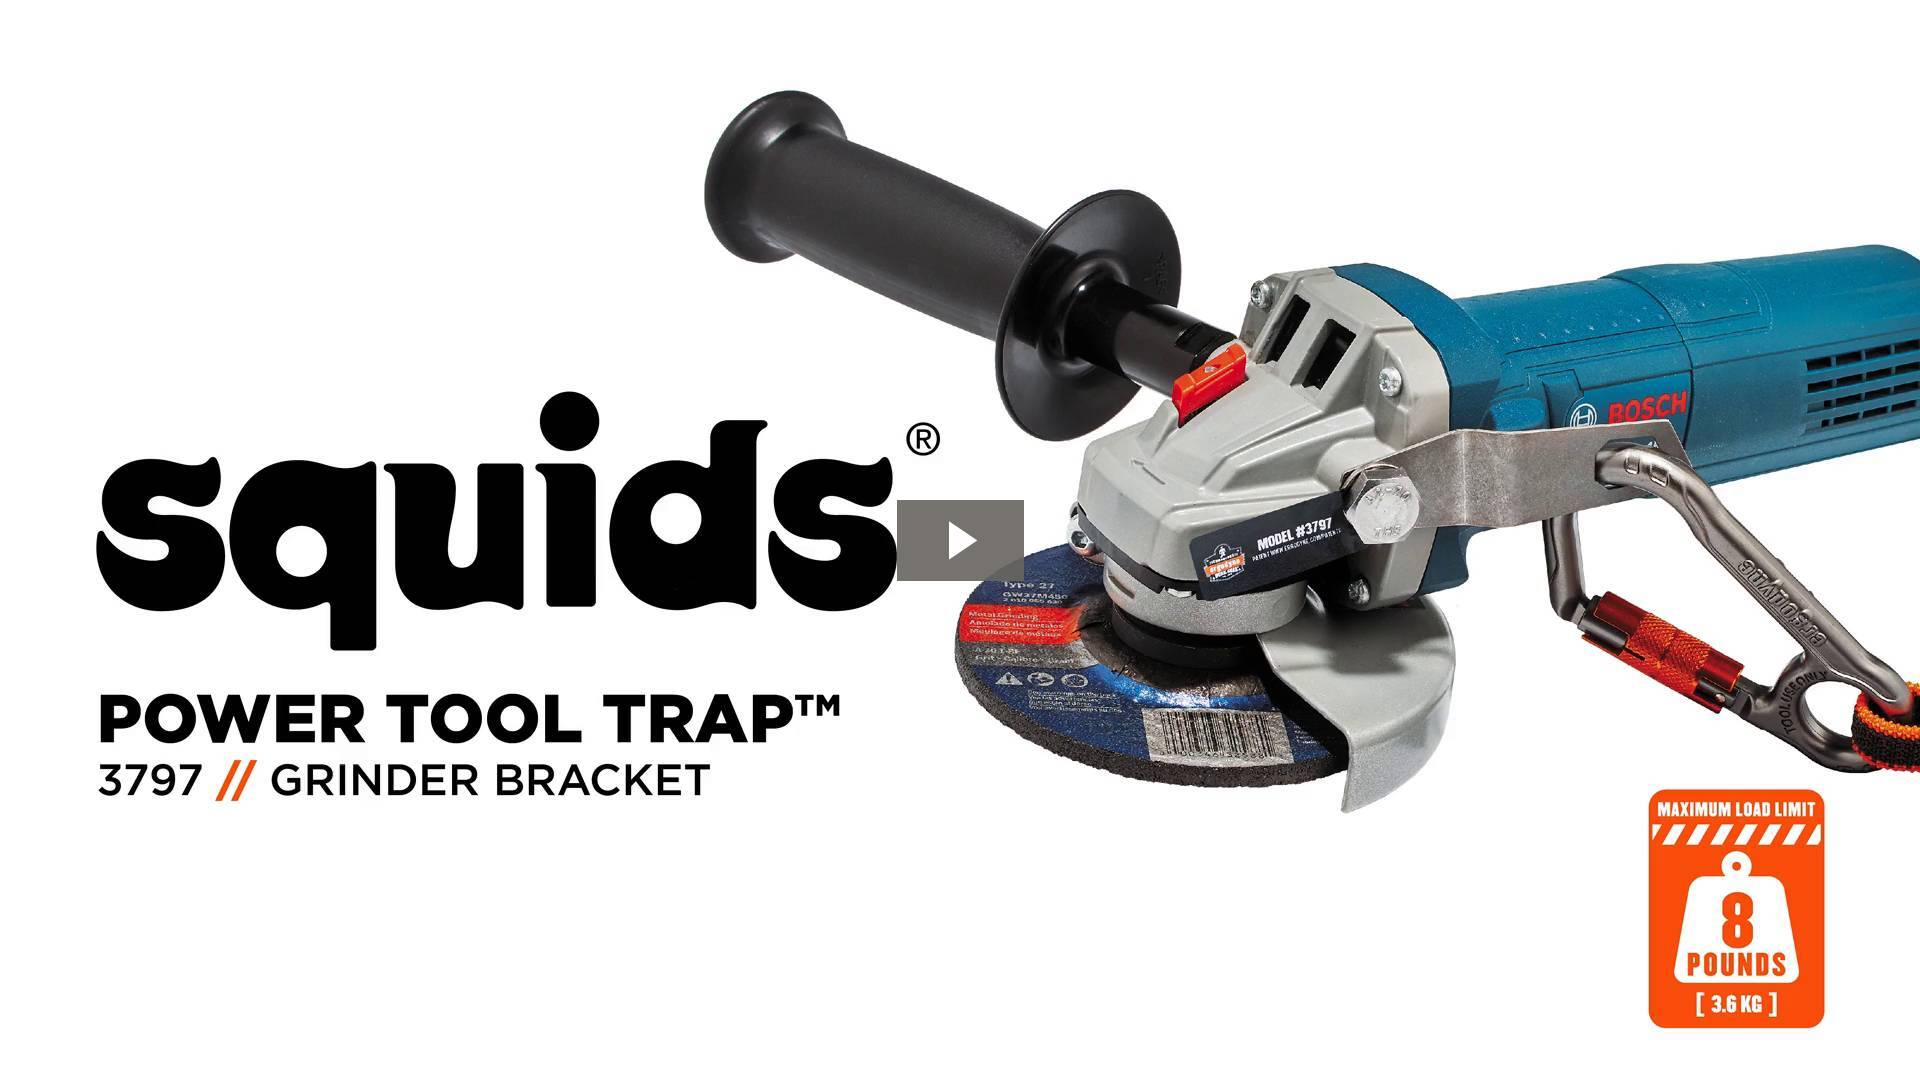 Ergodyne Product Video - Squids<sup>®</sup> 3797 Power Tool Bracket – Grinder Tool Trap<sup>™</sup>